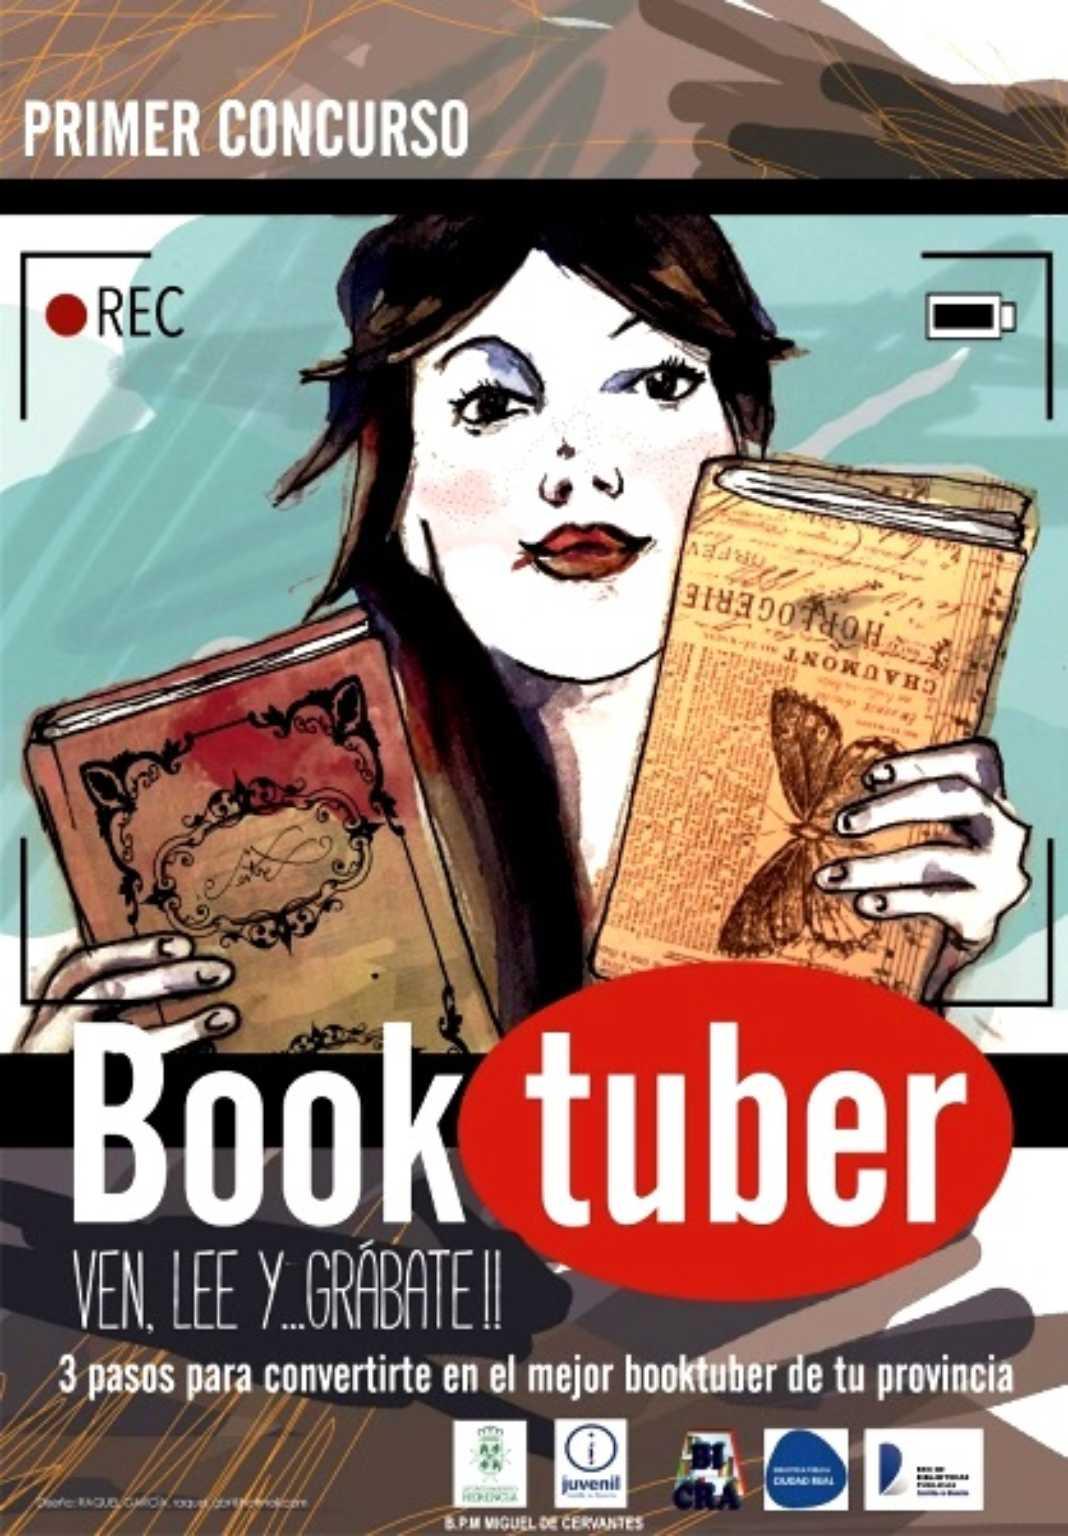 BOOKTUBERS: Los Hermogeneros disfrutan leyendo 5